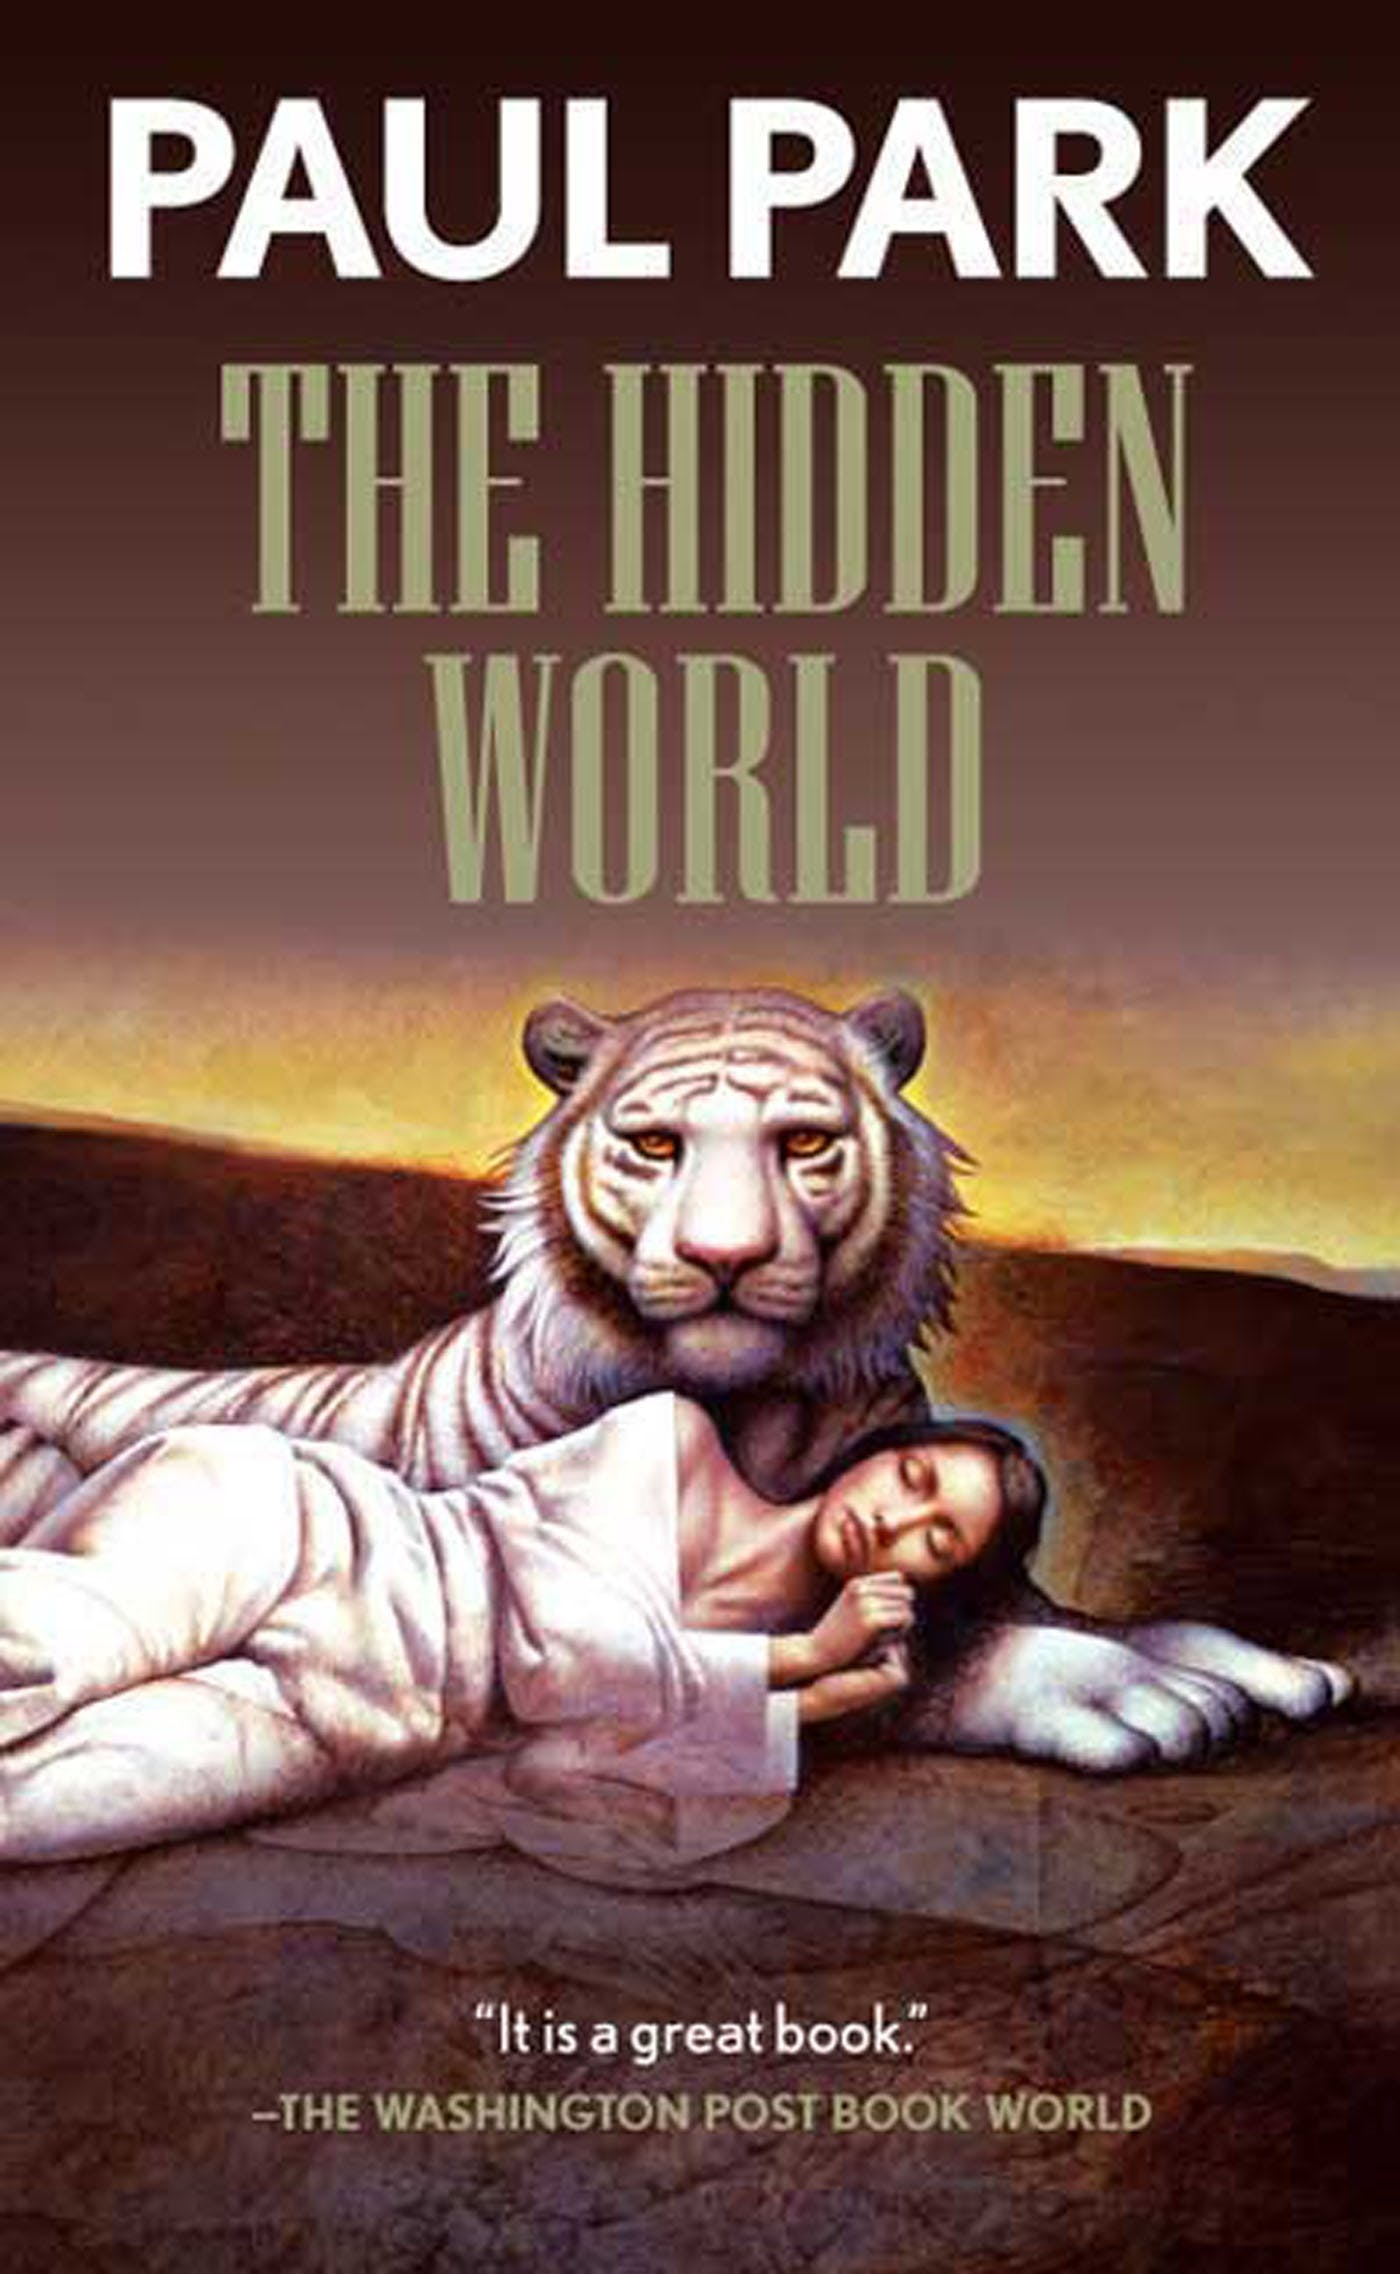 Image of The Hidden World